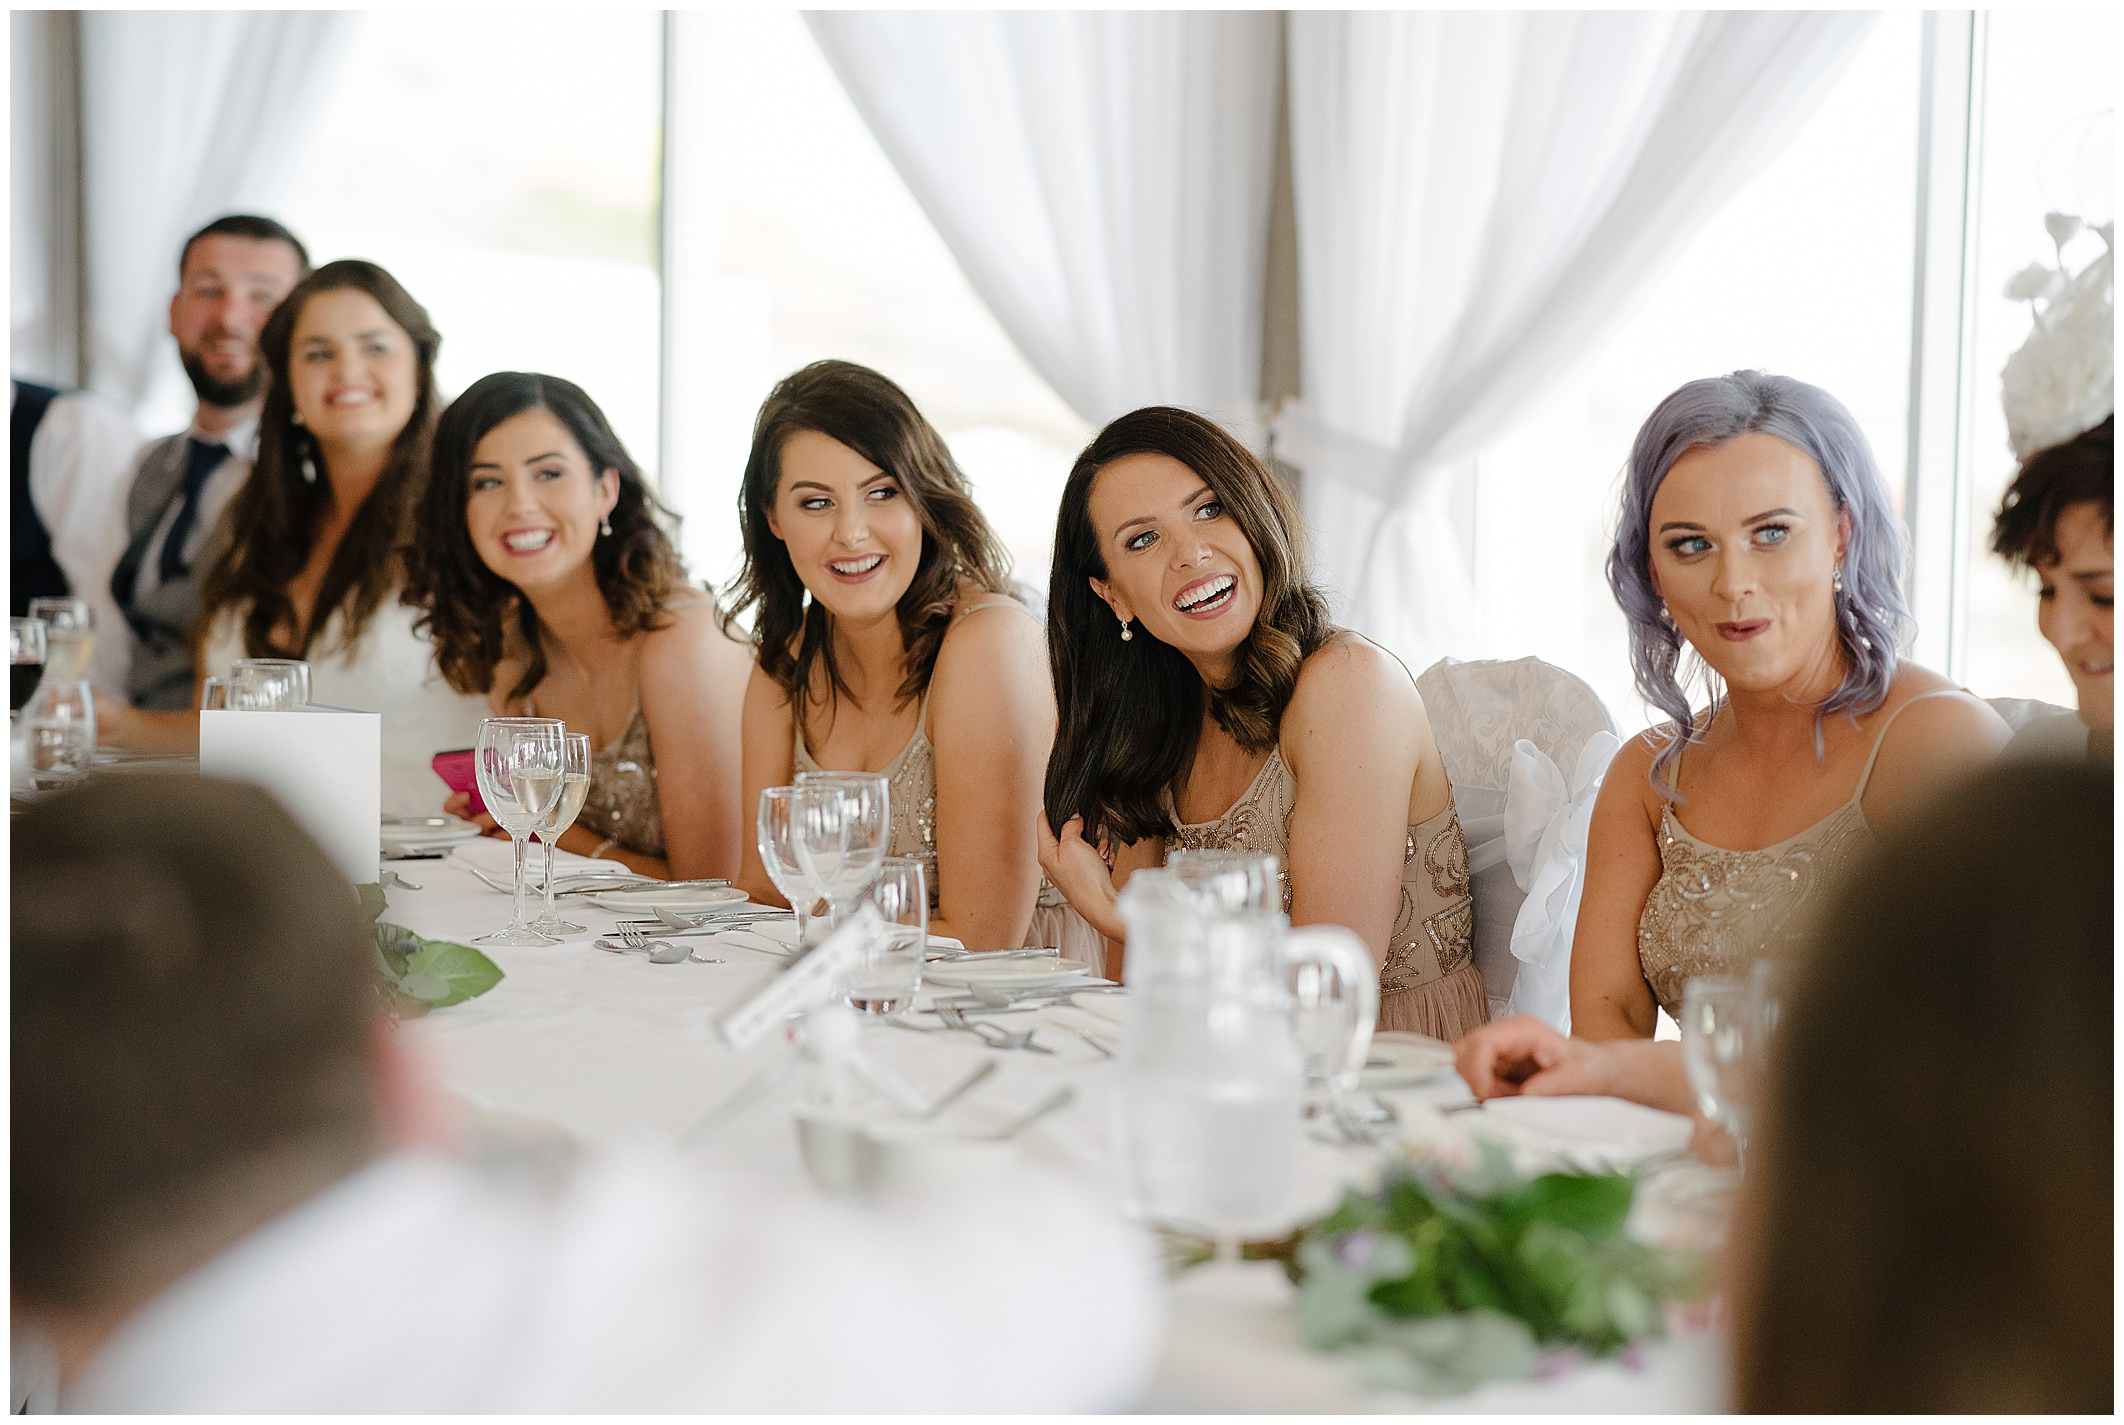 redcastle-hotel-wedding-karen-brian-jude-browne-photography-113.jpg